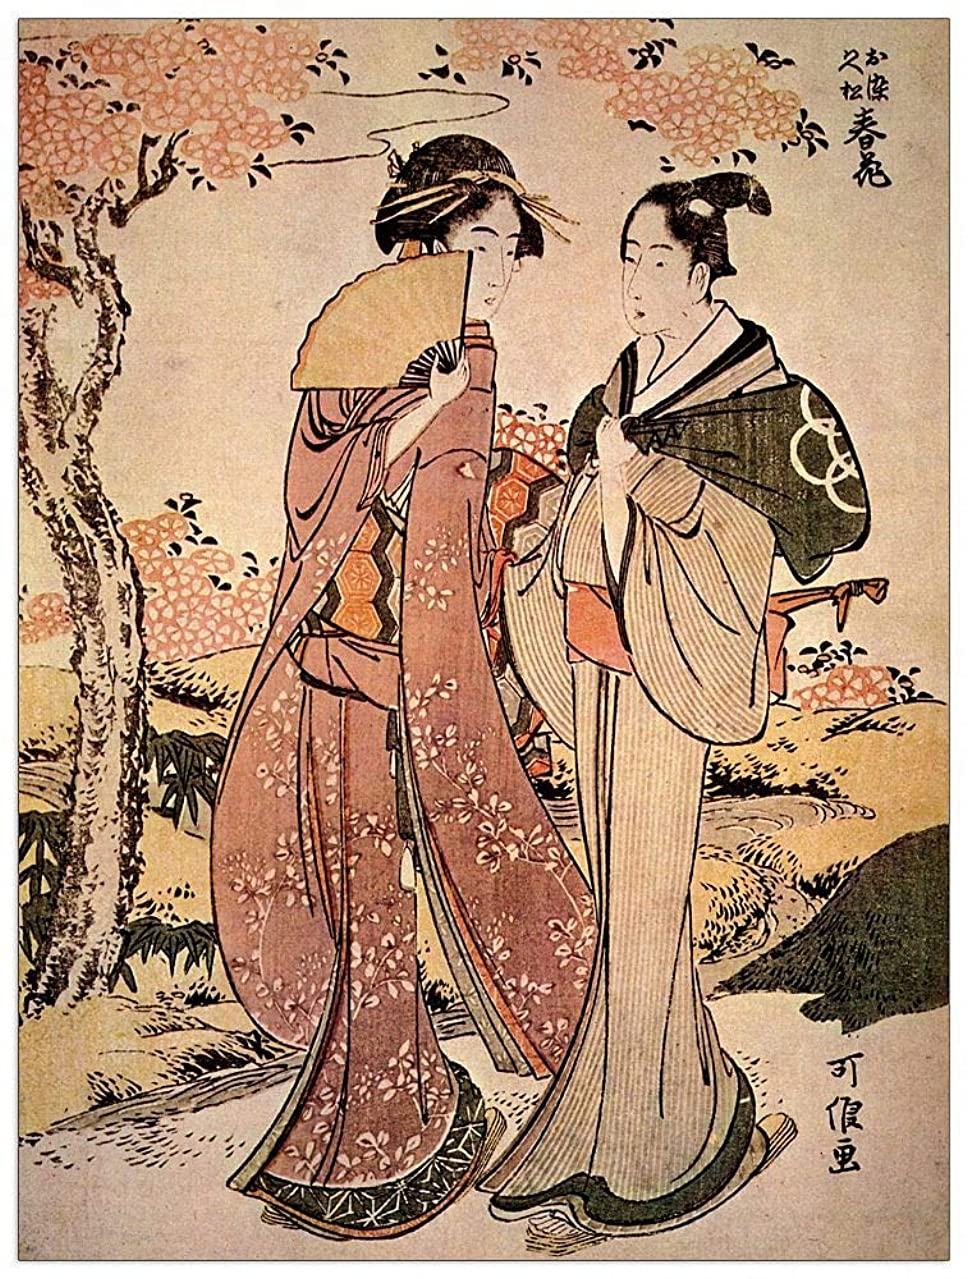 ArtPlaza TW90185 Hokusai Katsushika - Two Women Decorative Panel 27.5x35.5 Inch Multicolored